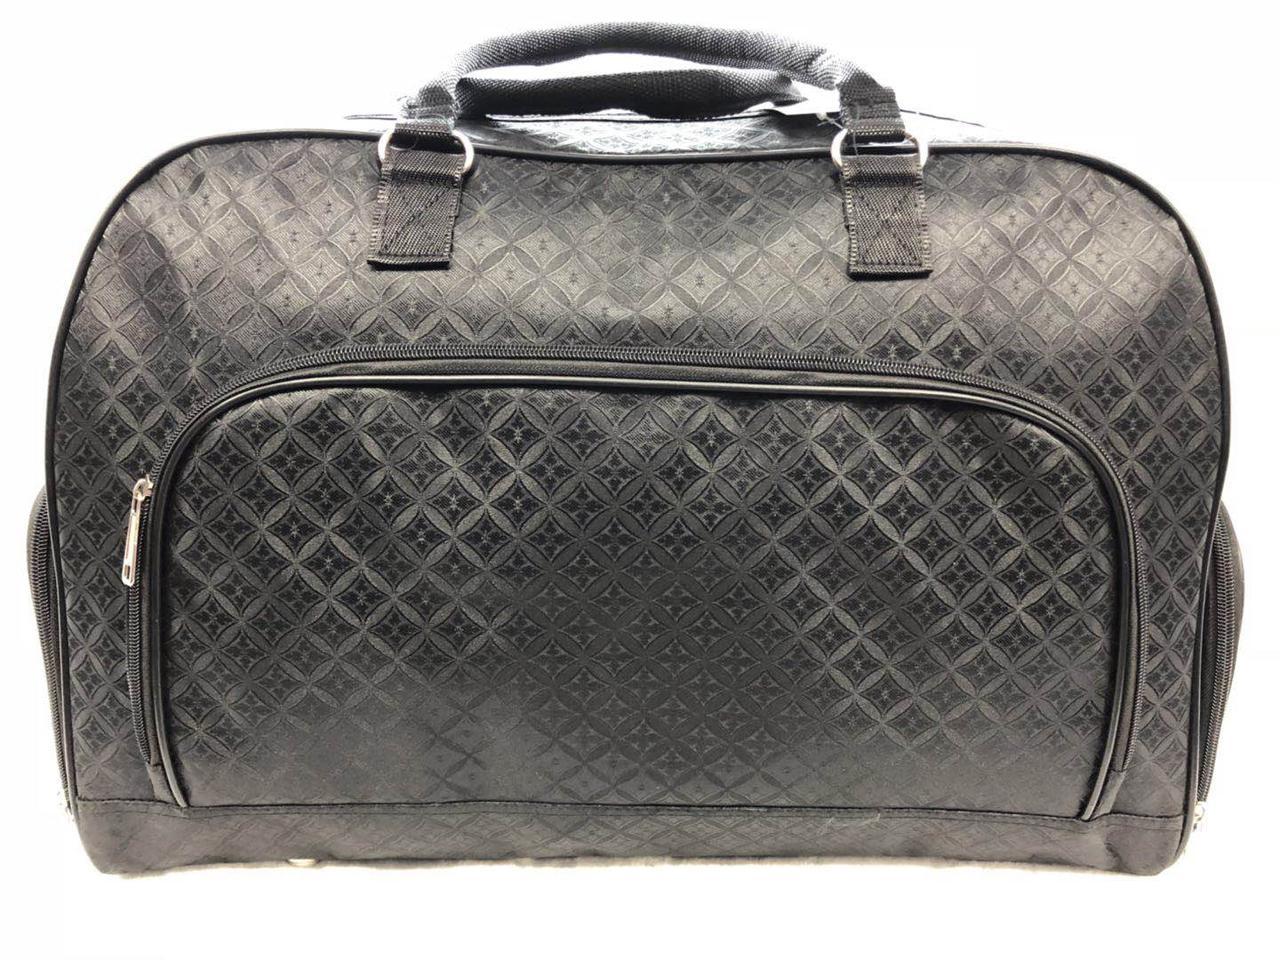 Велика чорна дорожня сумка-саквояж текстильна жіноча